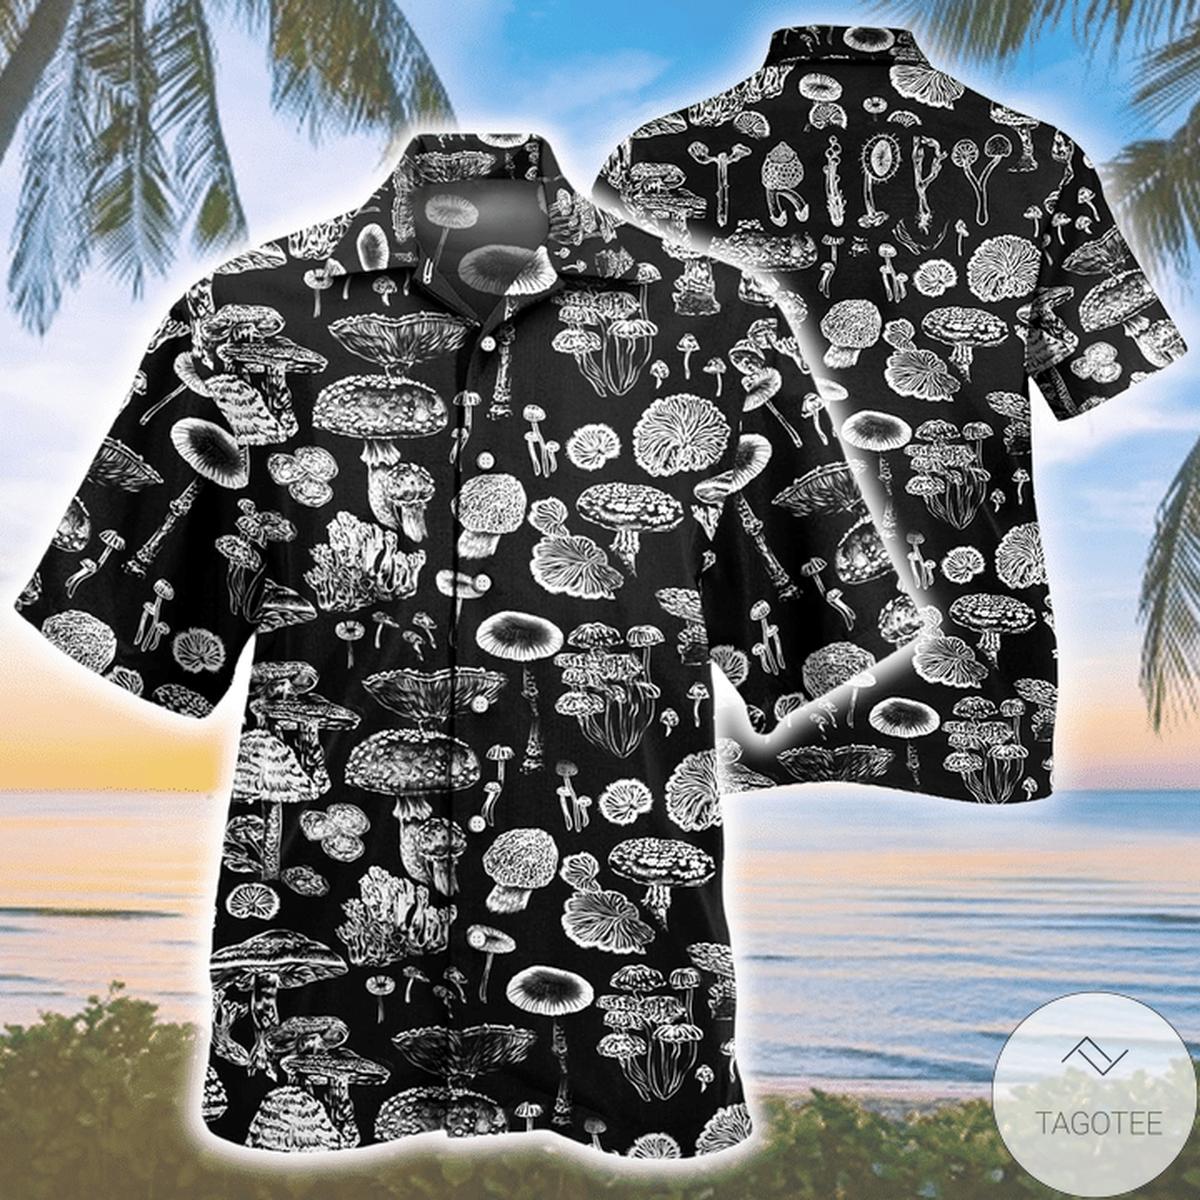 Drop Shipping Mushroom Pattern Black And White Hawaiian Shirt